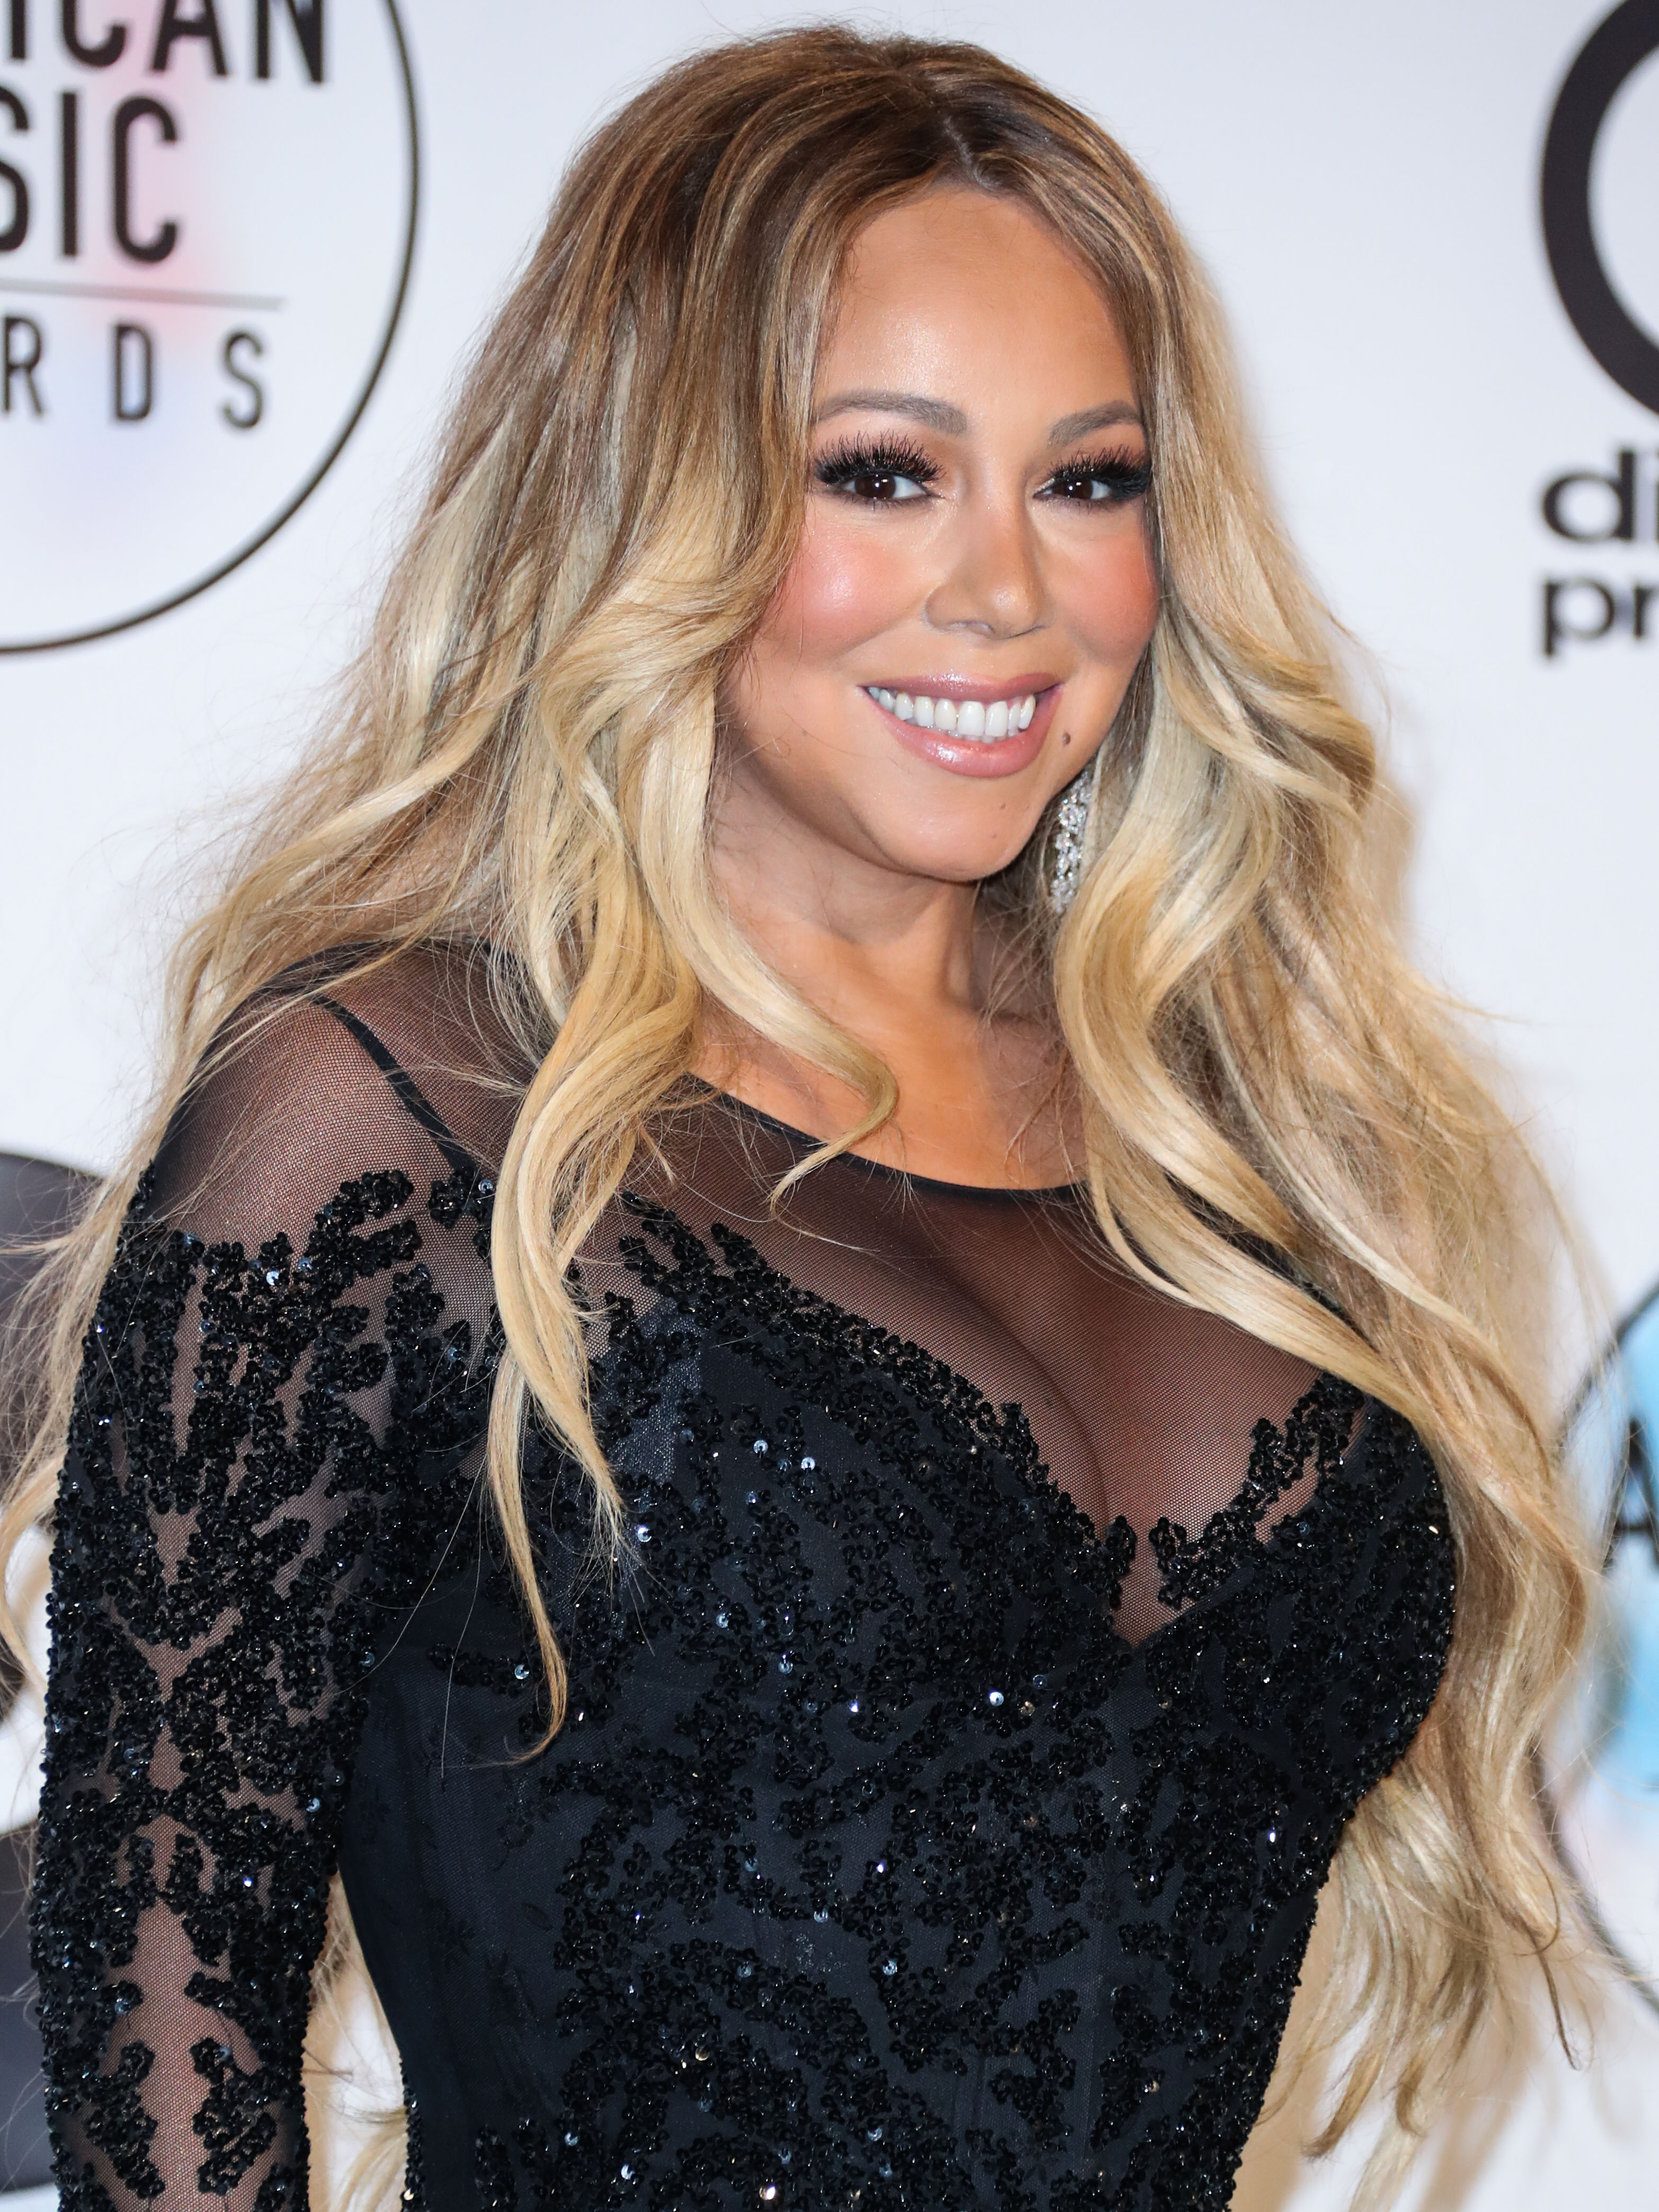 H Mariah Carey τραγουδάει το «All I want for Christmas» ενώ κάνει makeup και μαλλιά! | tlife.gr